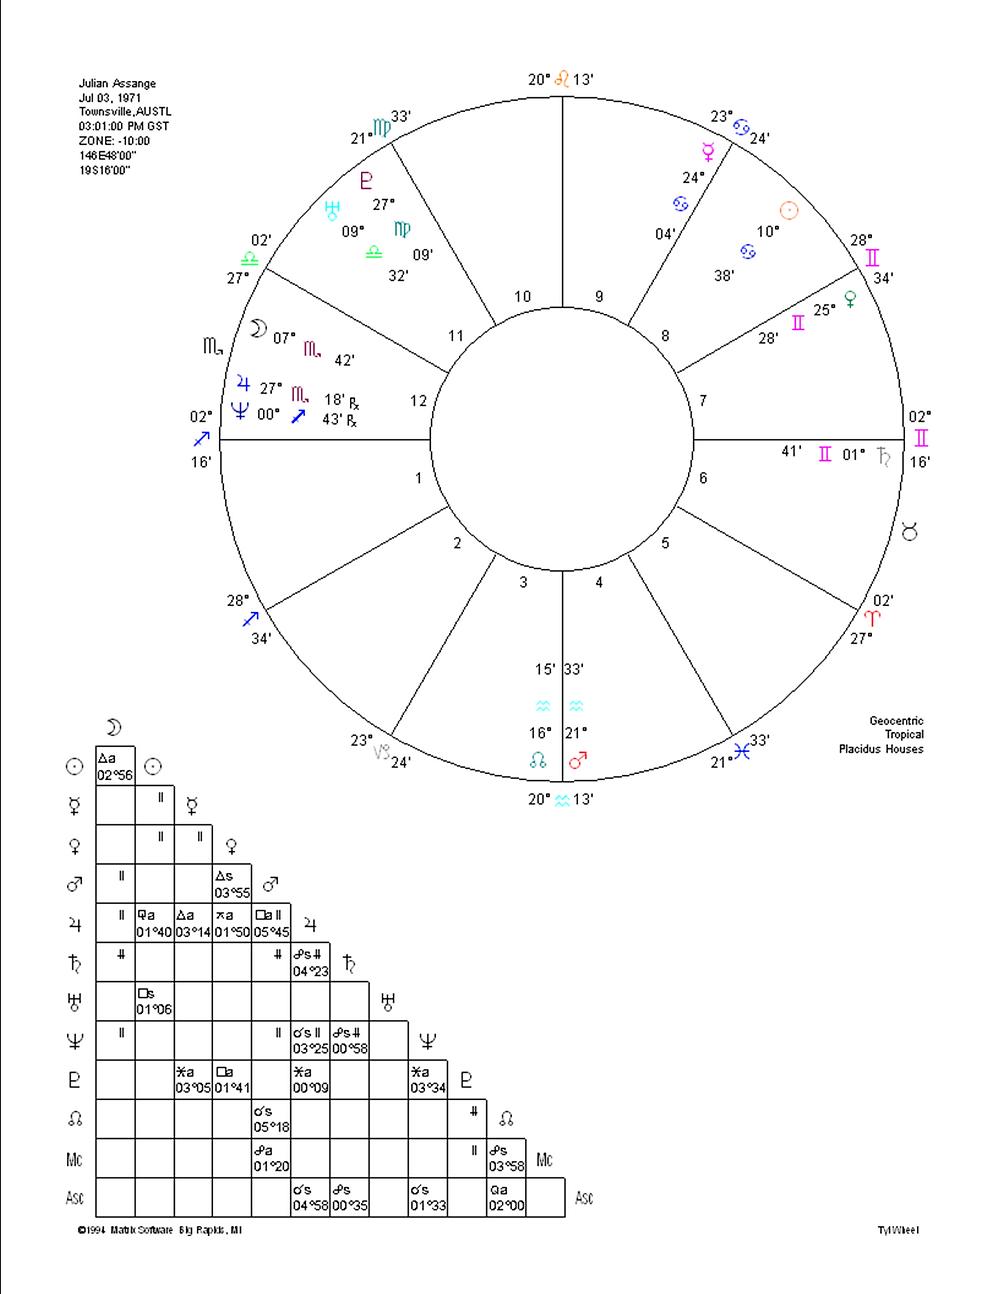 Birth Time Rectification Julian Assange by Astrologer Lauren Delsack